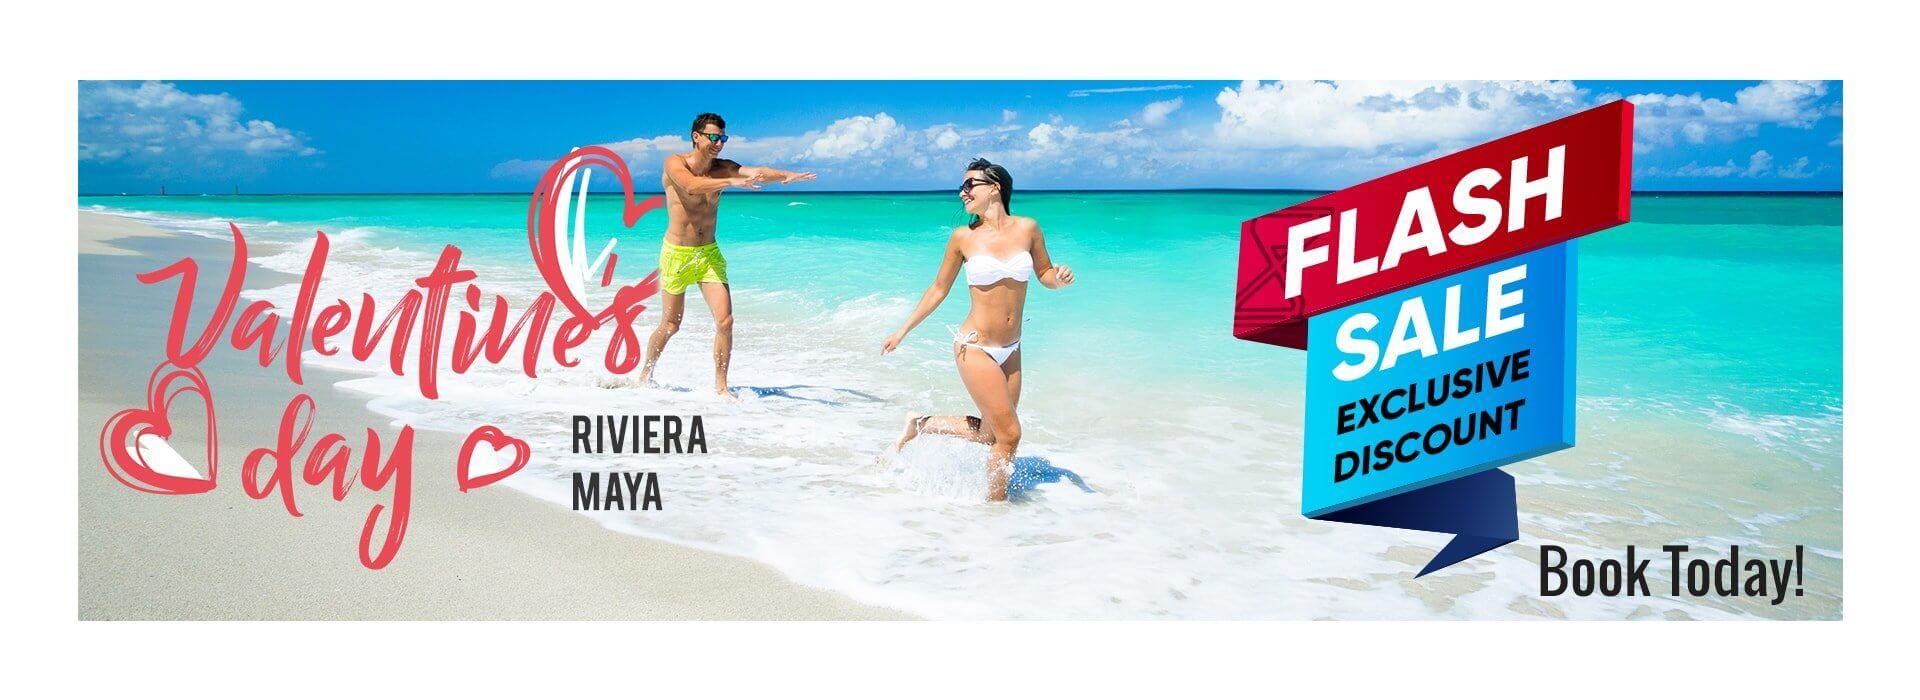 St Valentine's Flash Sale for Riviera Maya Vacations